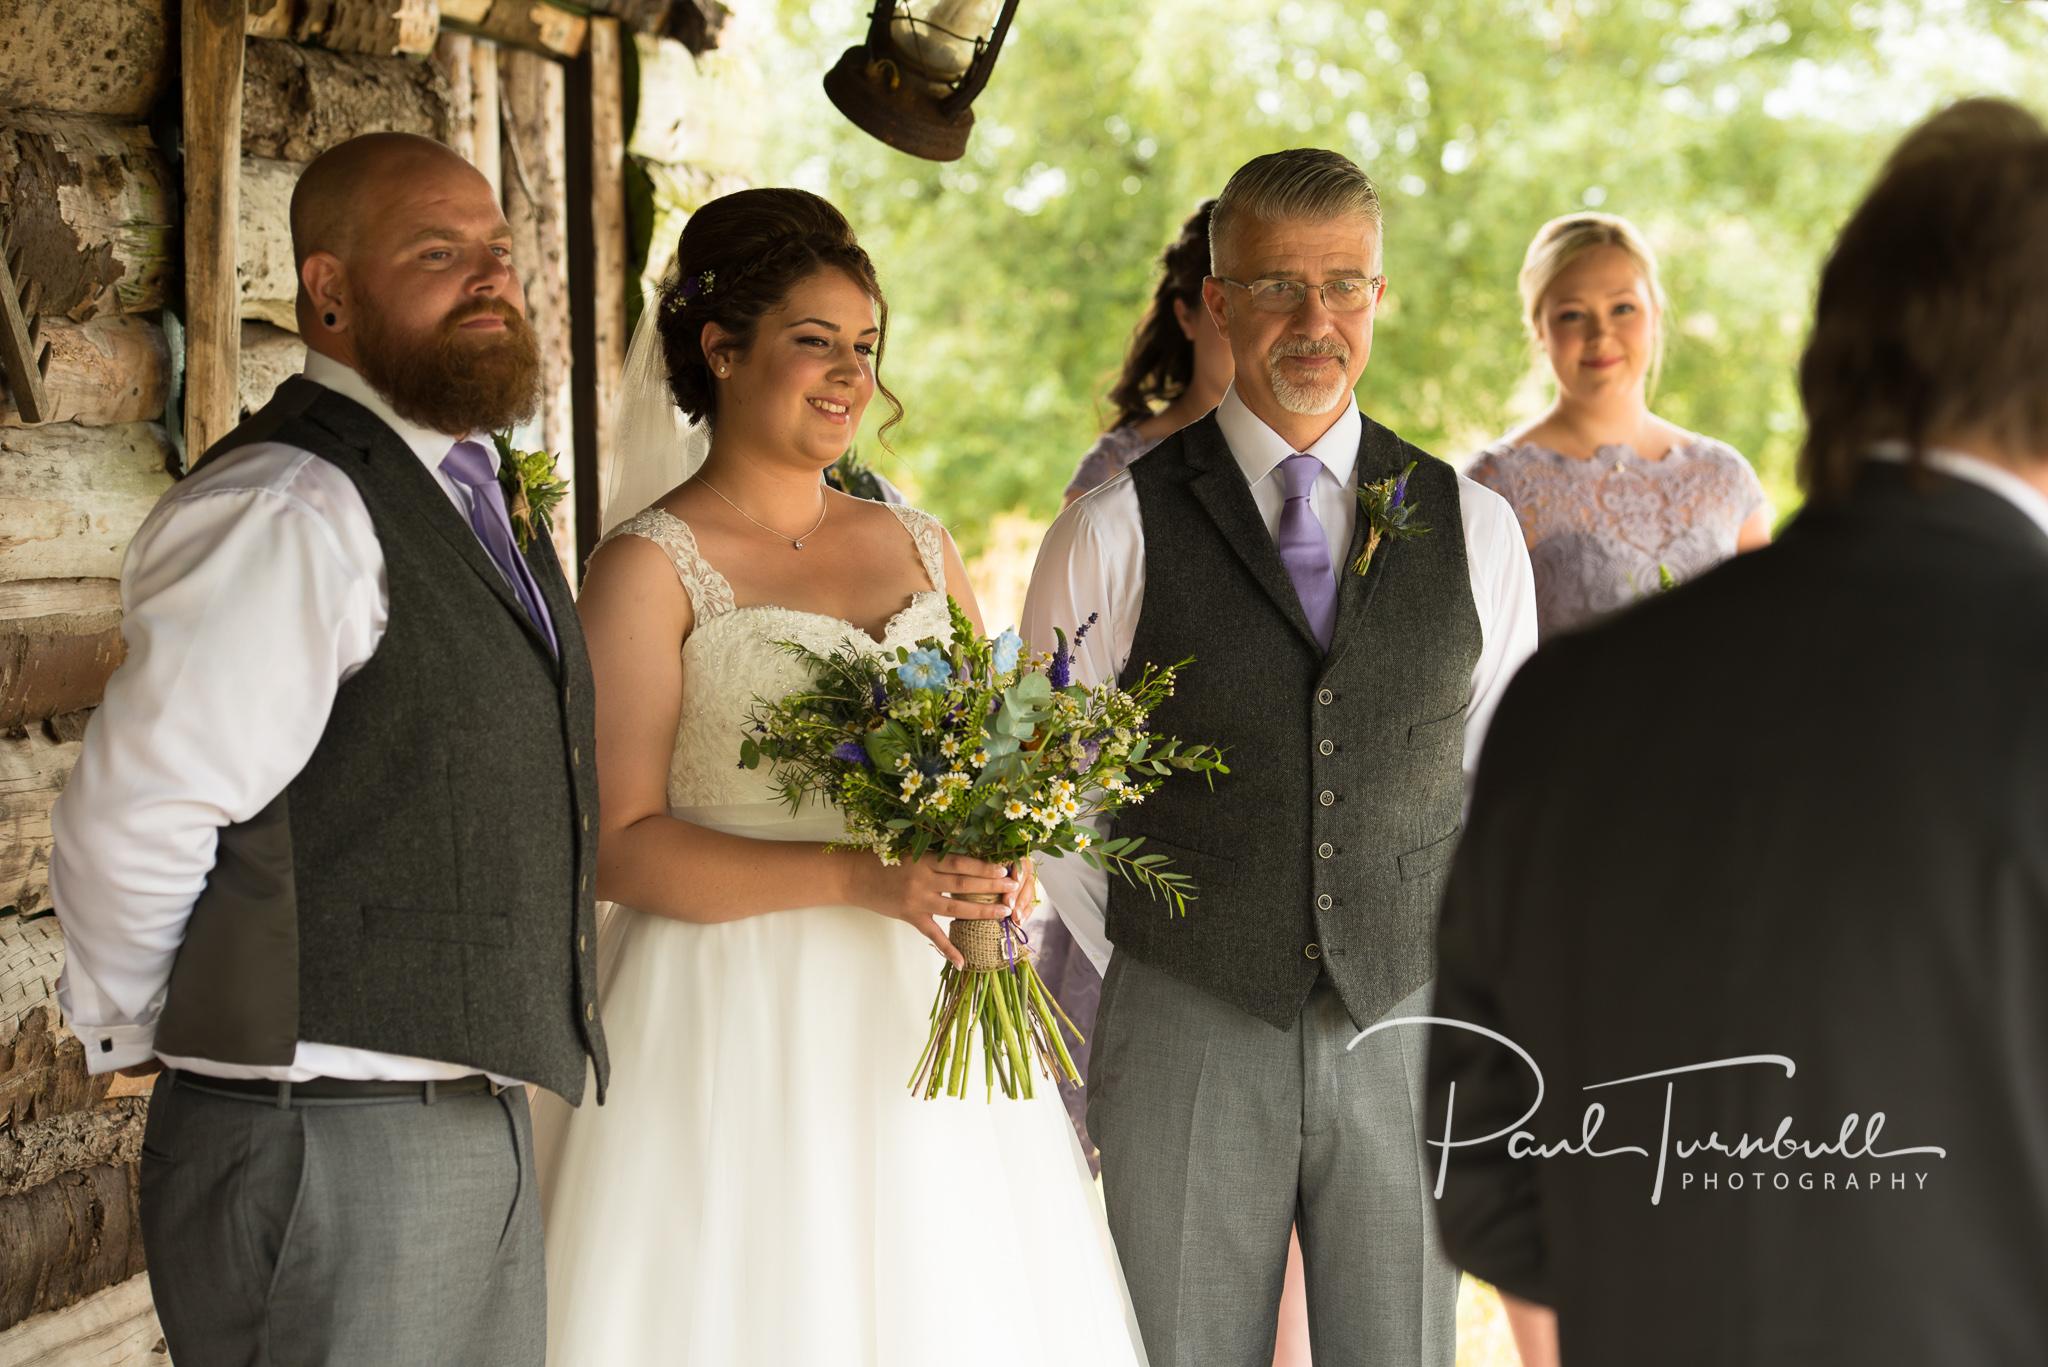 wedding-photographer-hilltop-farm-ilton-yorkshire-013.jpg